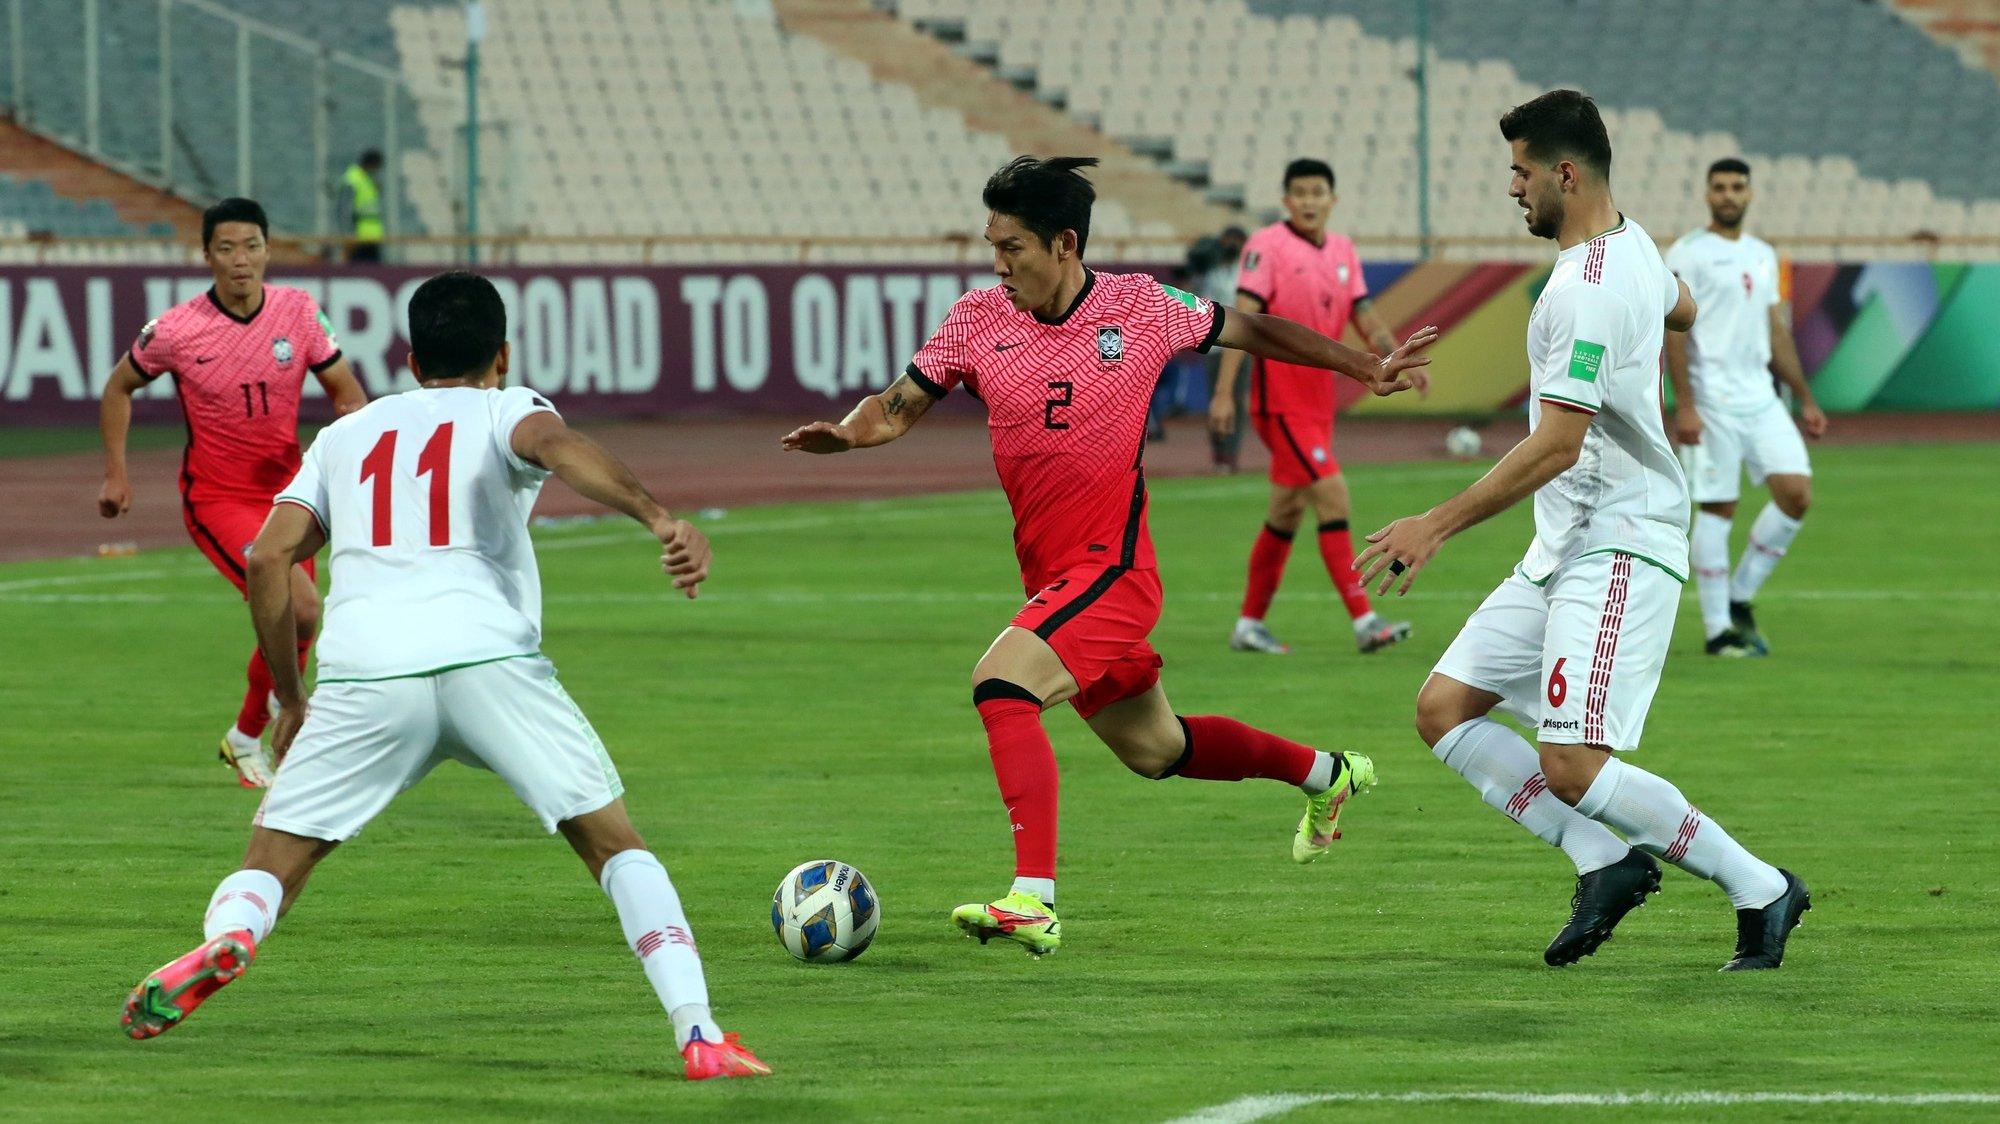 epa09520114 Iran's Vahid Amiri (L) in action against South Korea's Lee Yong (C) during the FIFA World Cup 2022 qualifying soccer matchbetween Iran and South Korea at the Azadi Stadium in Tehran, Iran, 12 October 2021.  EPA/ABEDIN TAHERKENAREH